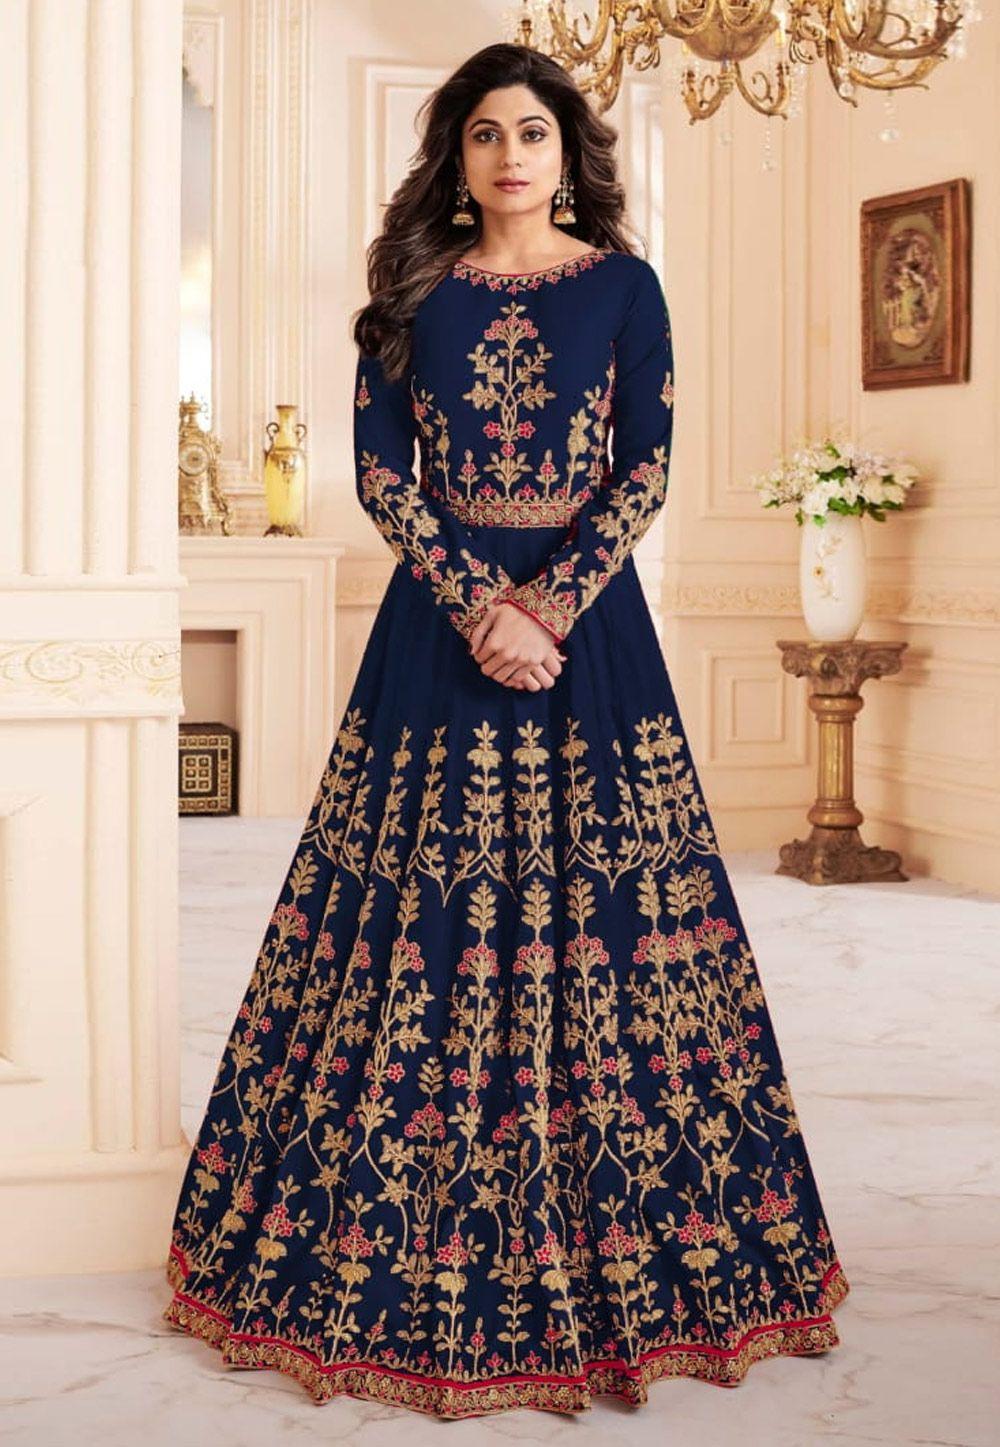 83922486d9 Buy Shamita Shetty Navy Blue Silk Floor Length Anarkali Suit 163633 online  at lowest price from huge collection of salwar kameez at  Indianclothstore.com.